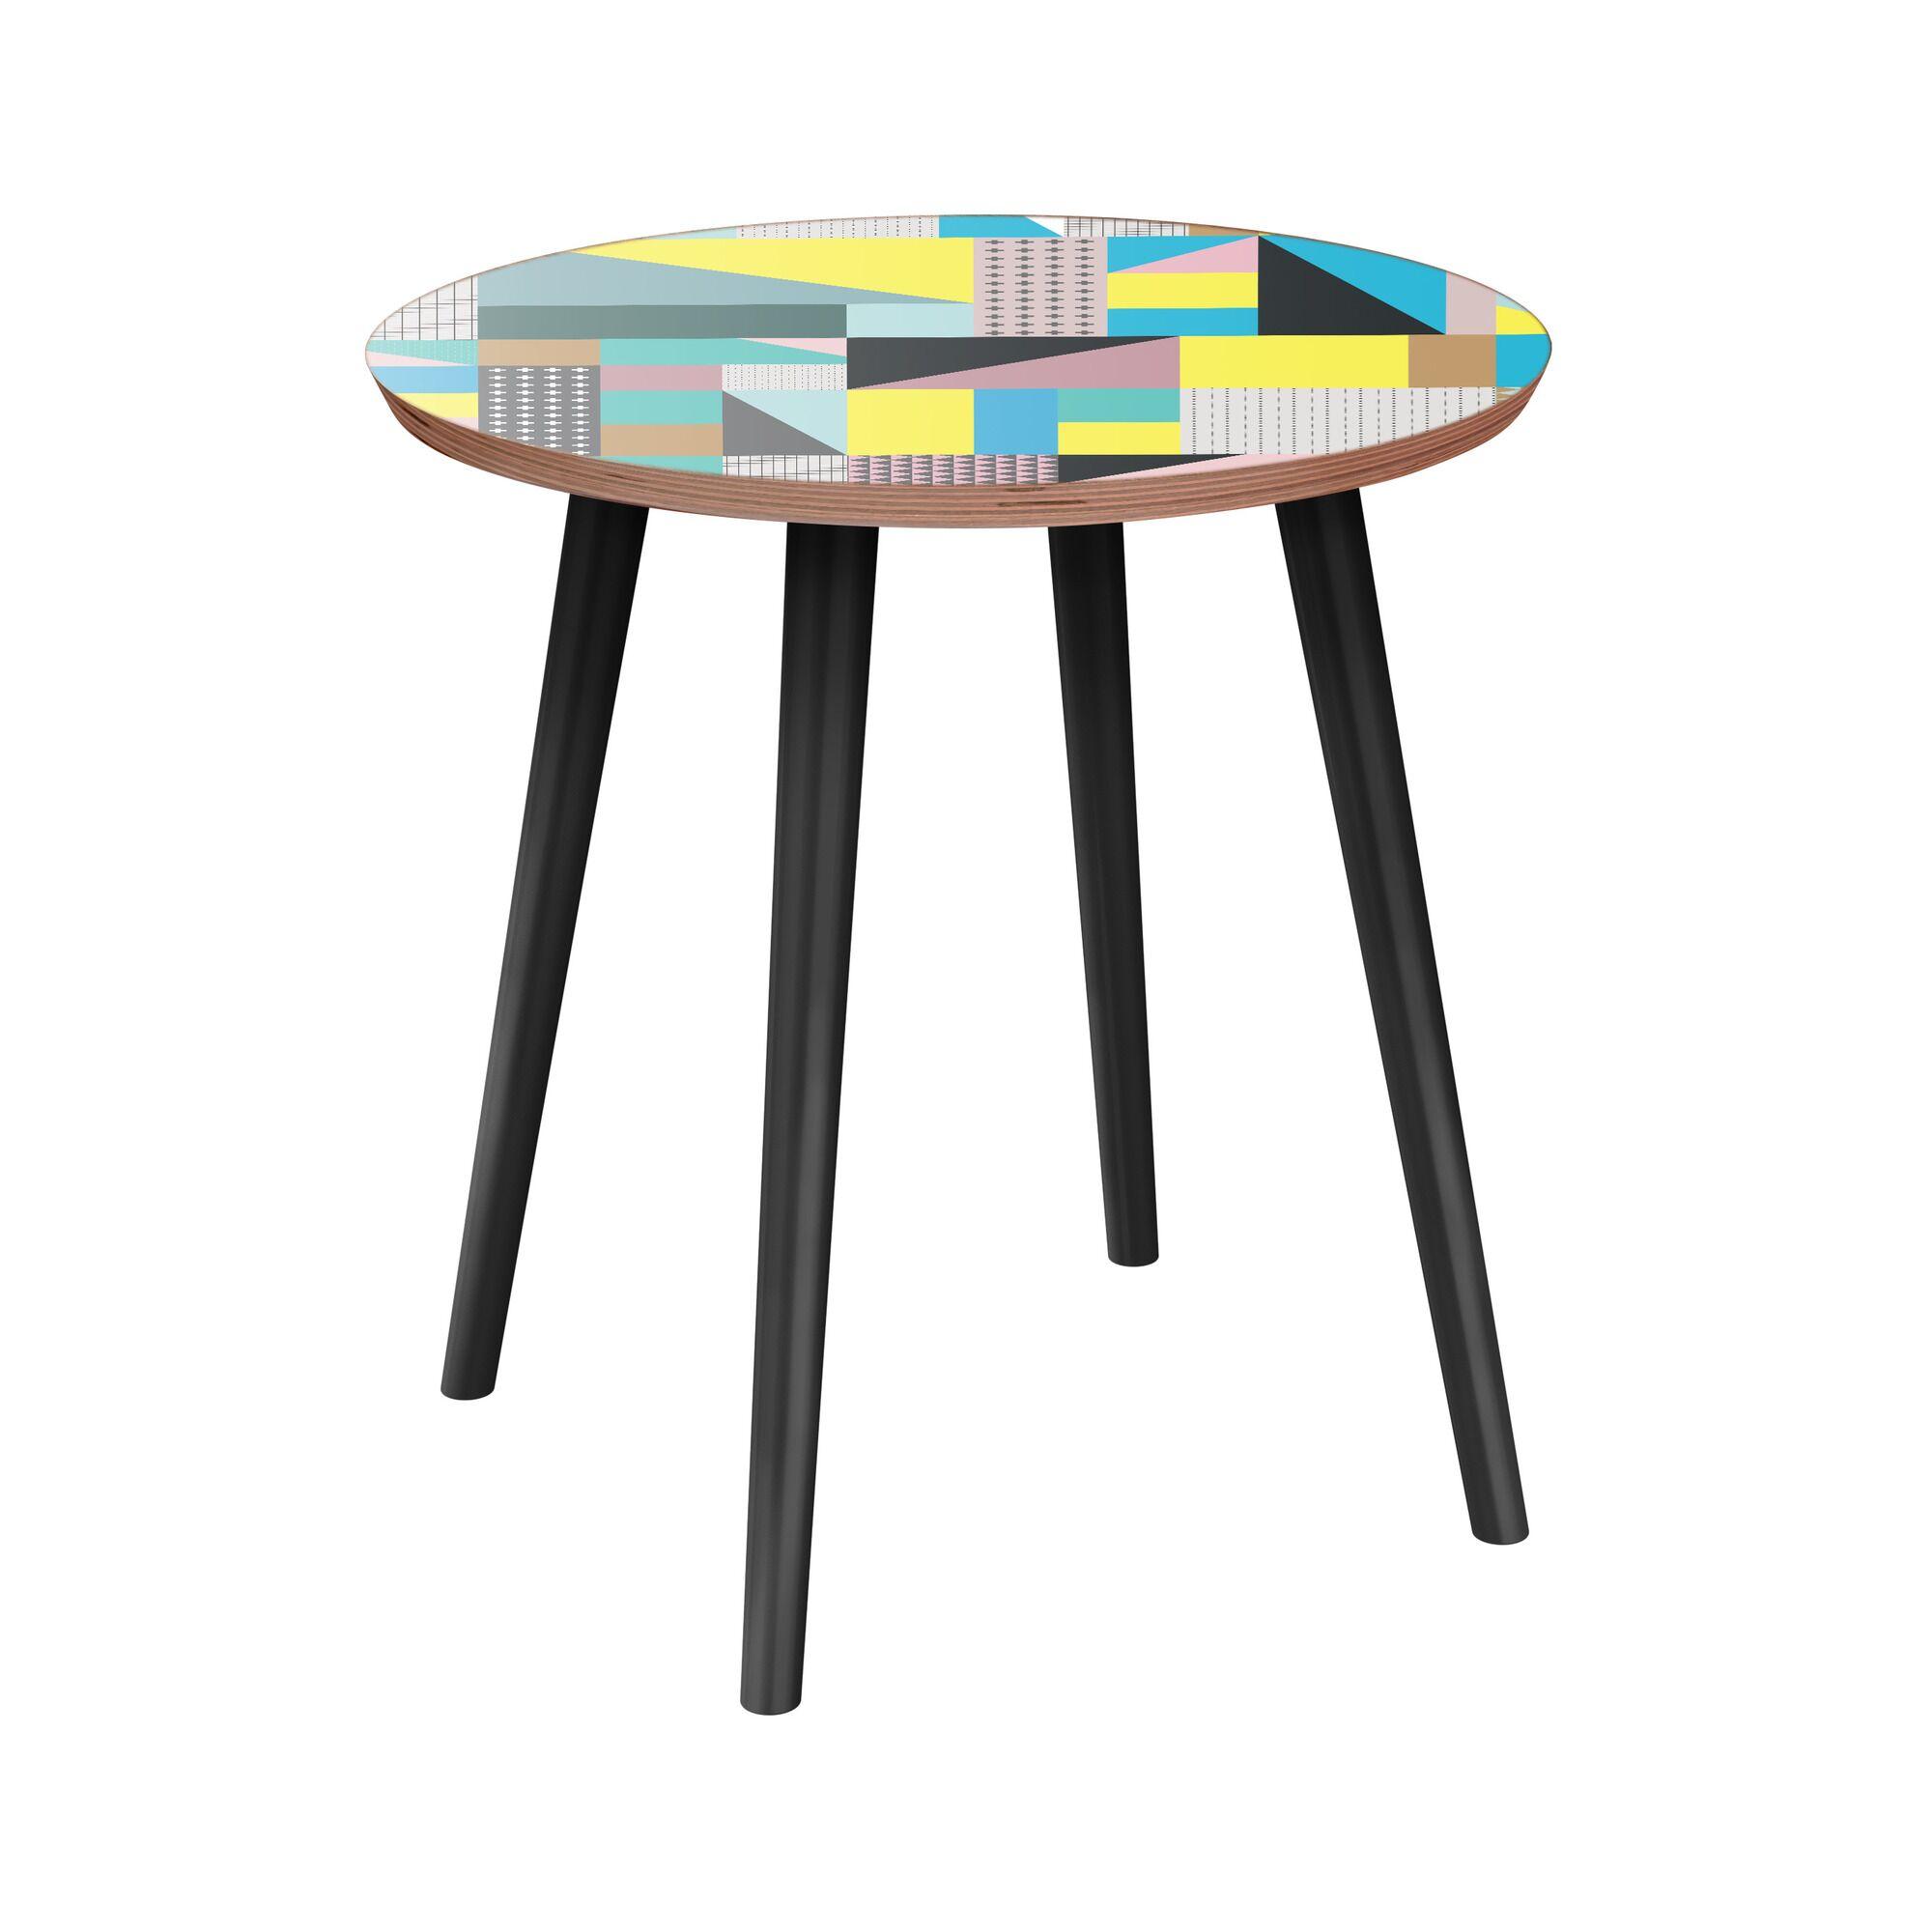 Laila End Table Table Base Color: Black, Table Top Color: Walnut